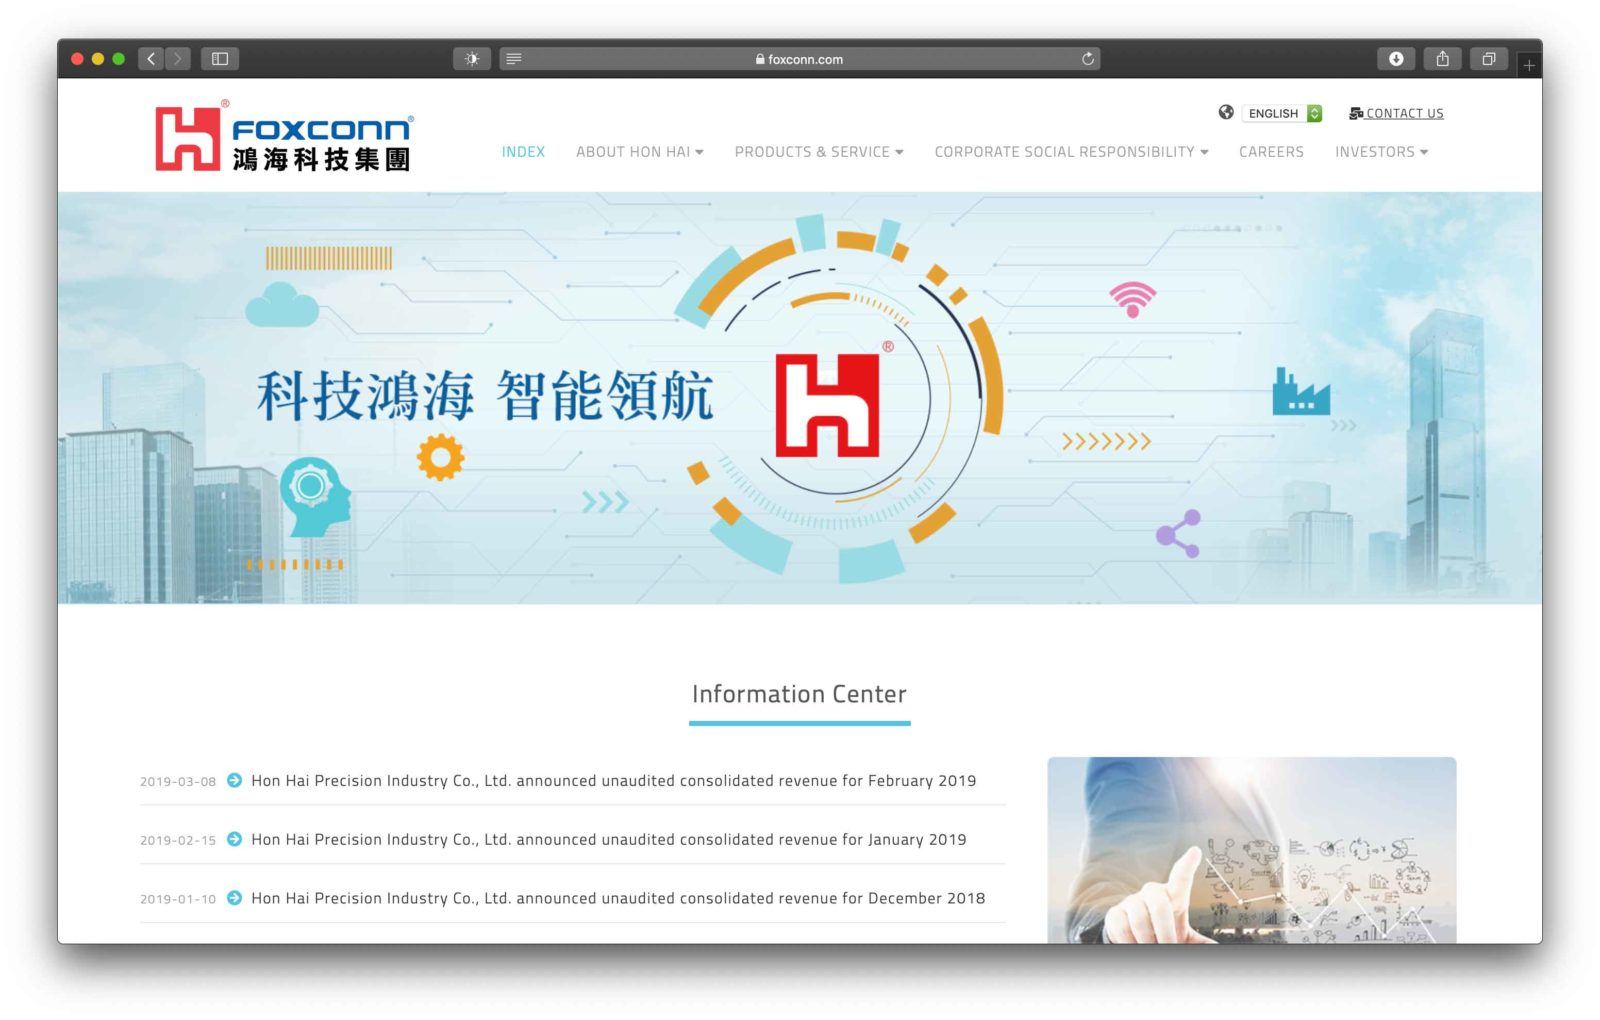 Terry Gou di Foxconn si dimette per candidarsi come Presidente a Taiwan